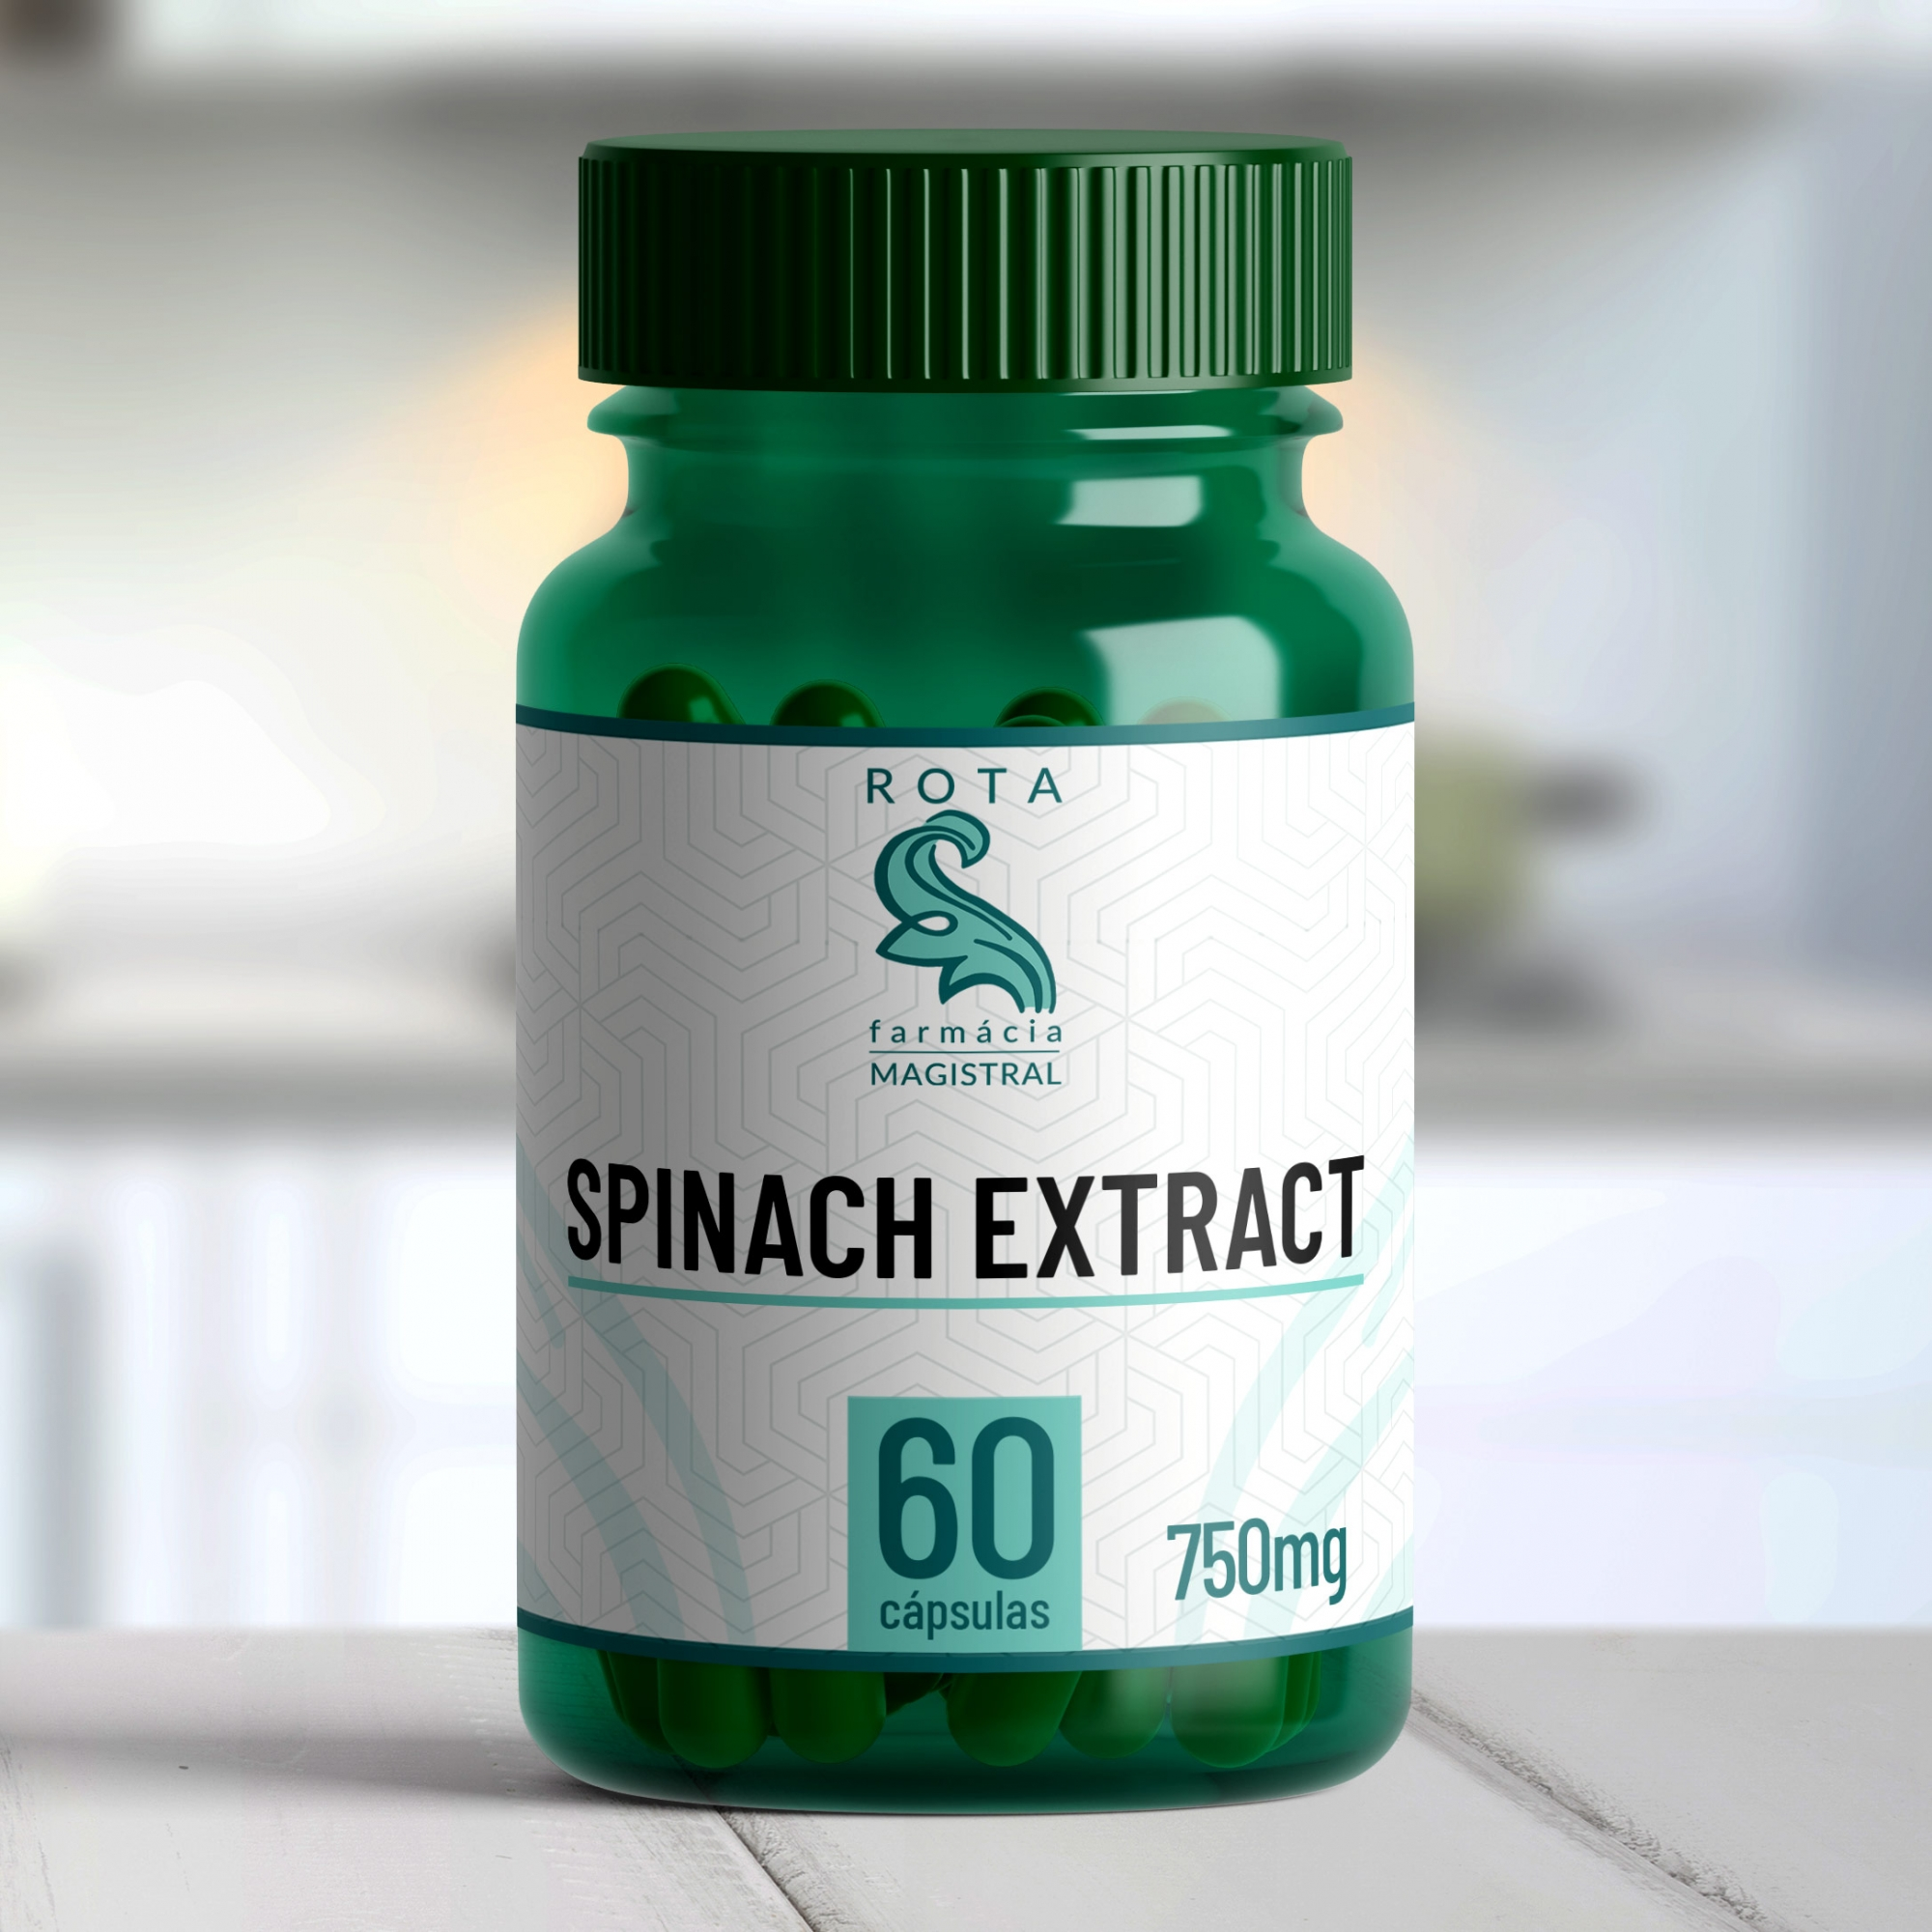 Spinach Extract (Espinafre) 750mg 60 cápsulas